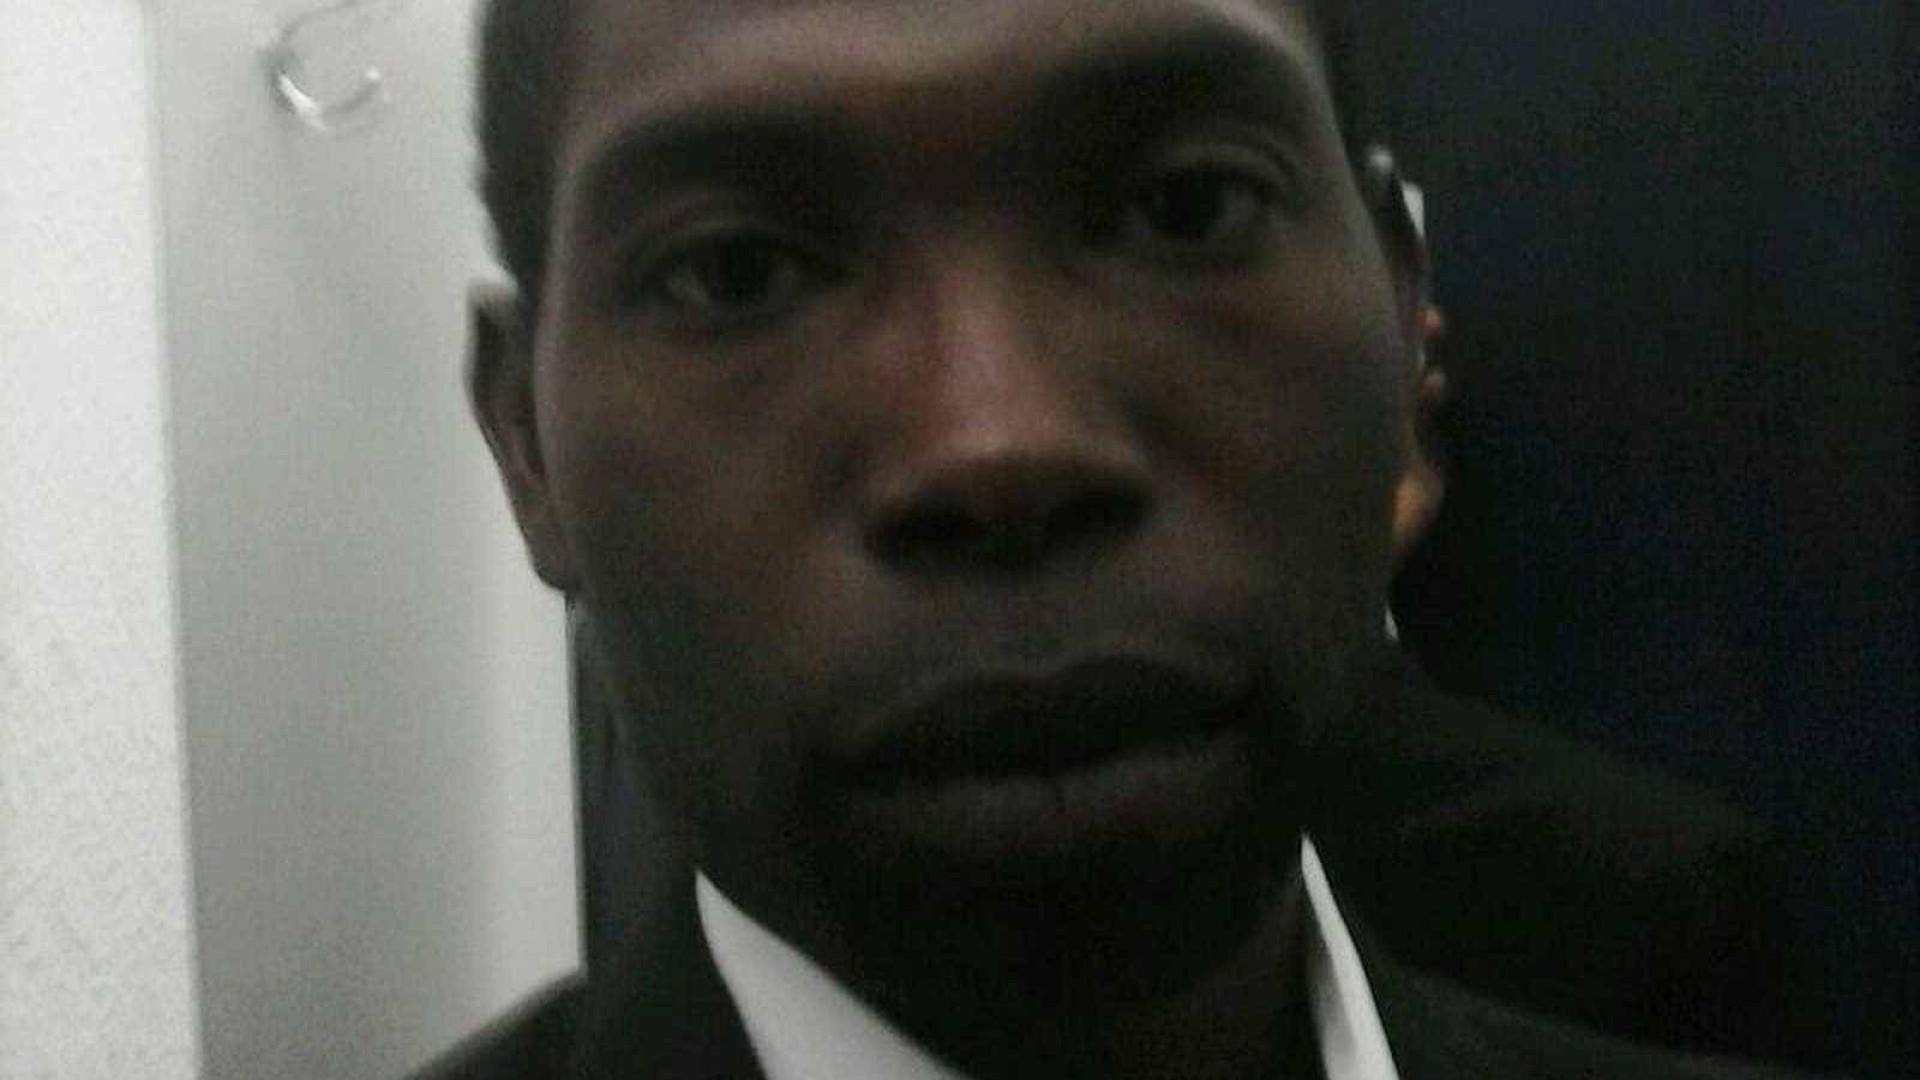 Vítima de racismo, funcionário público deixa de sair de casa